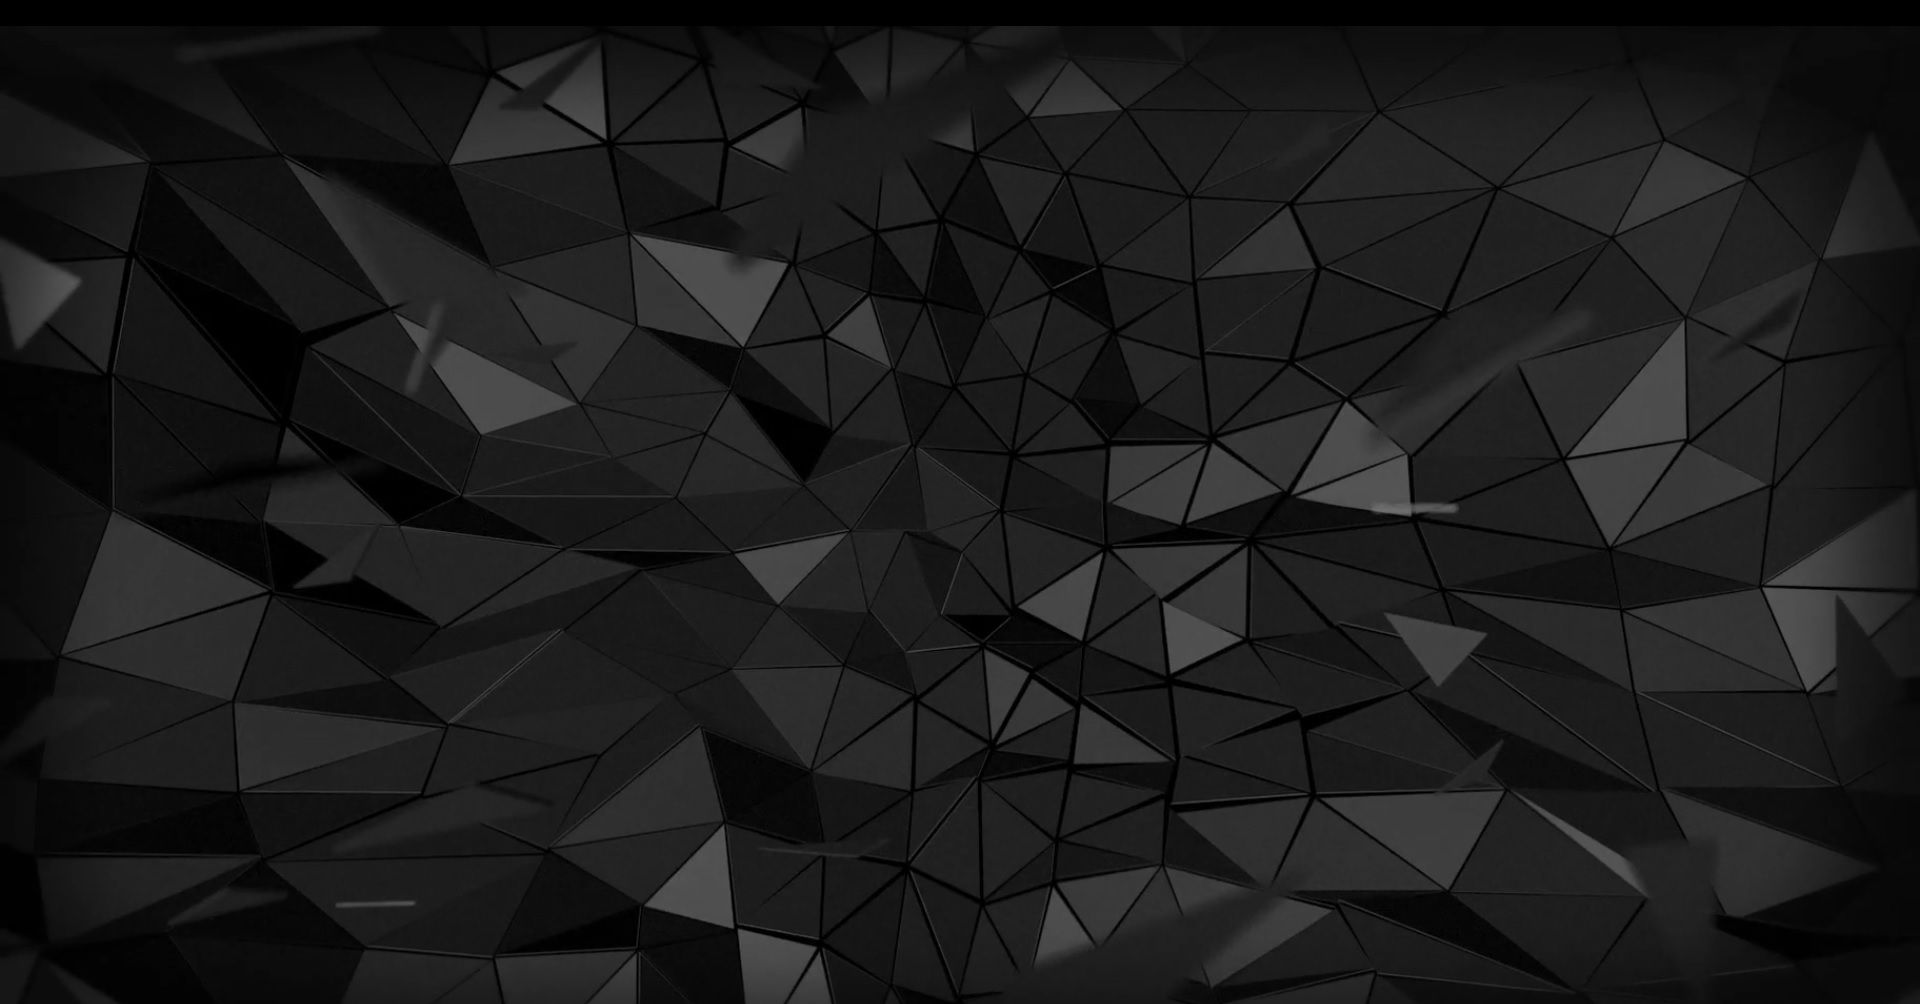 Pin By Jack Mark Huaman On Patterns Deus Ex Mankind Divided Deus Ex Wallpaper